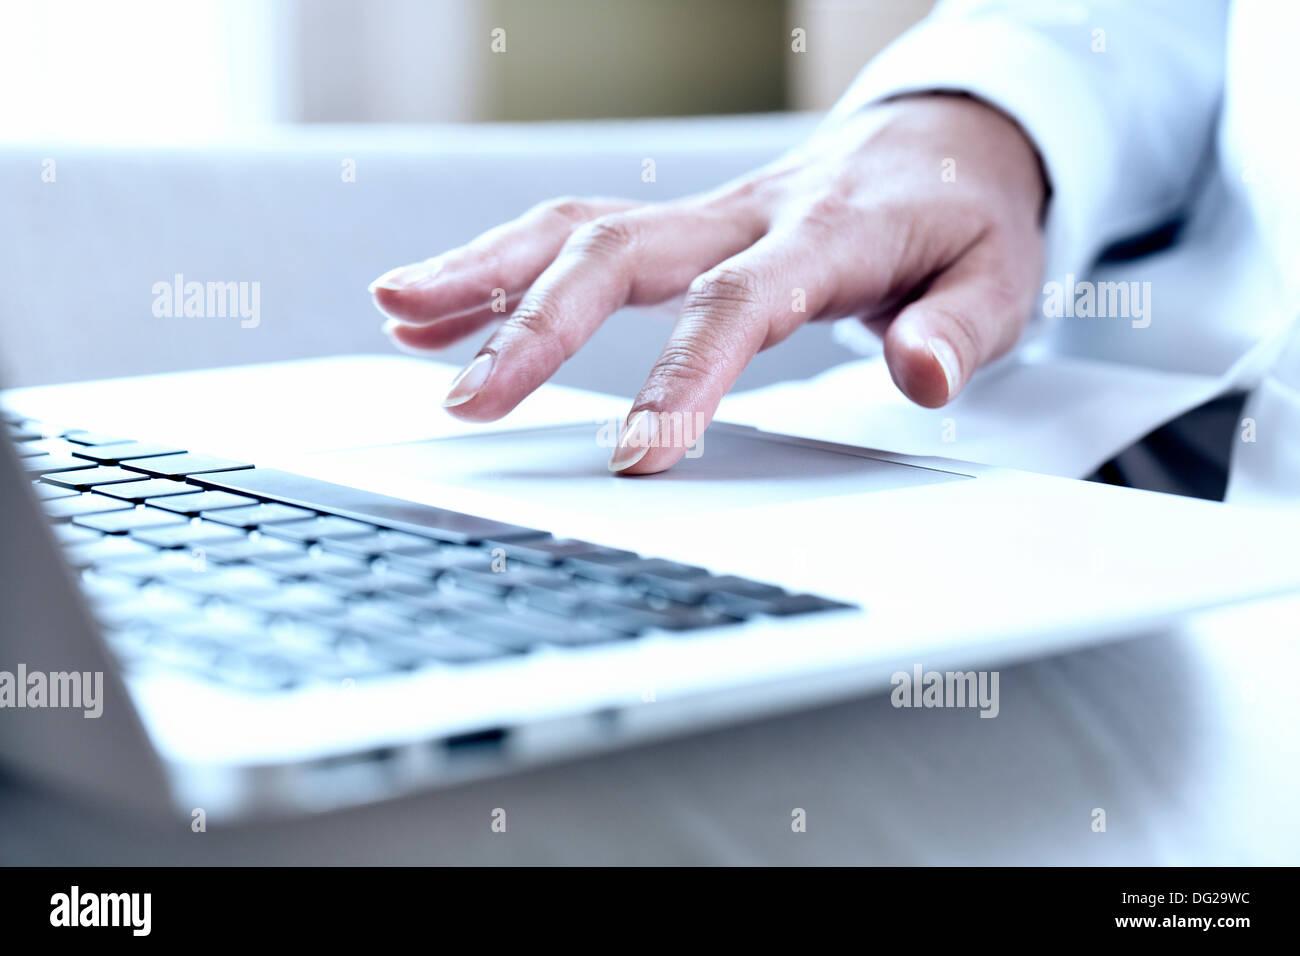 woman computer finger keyboard desk - Stock Image